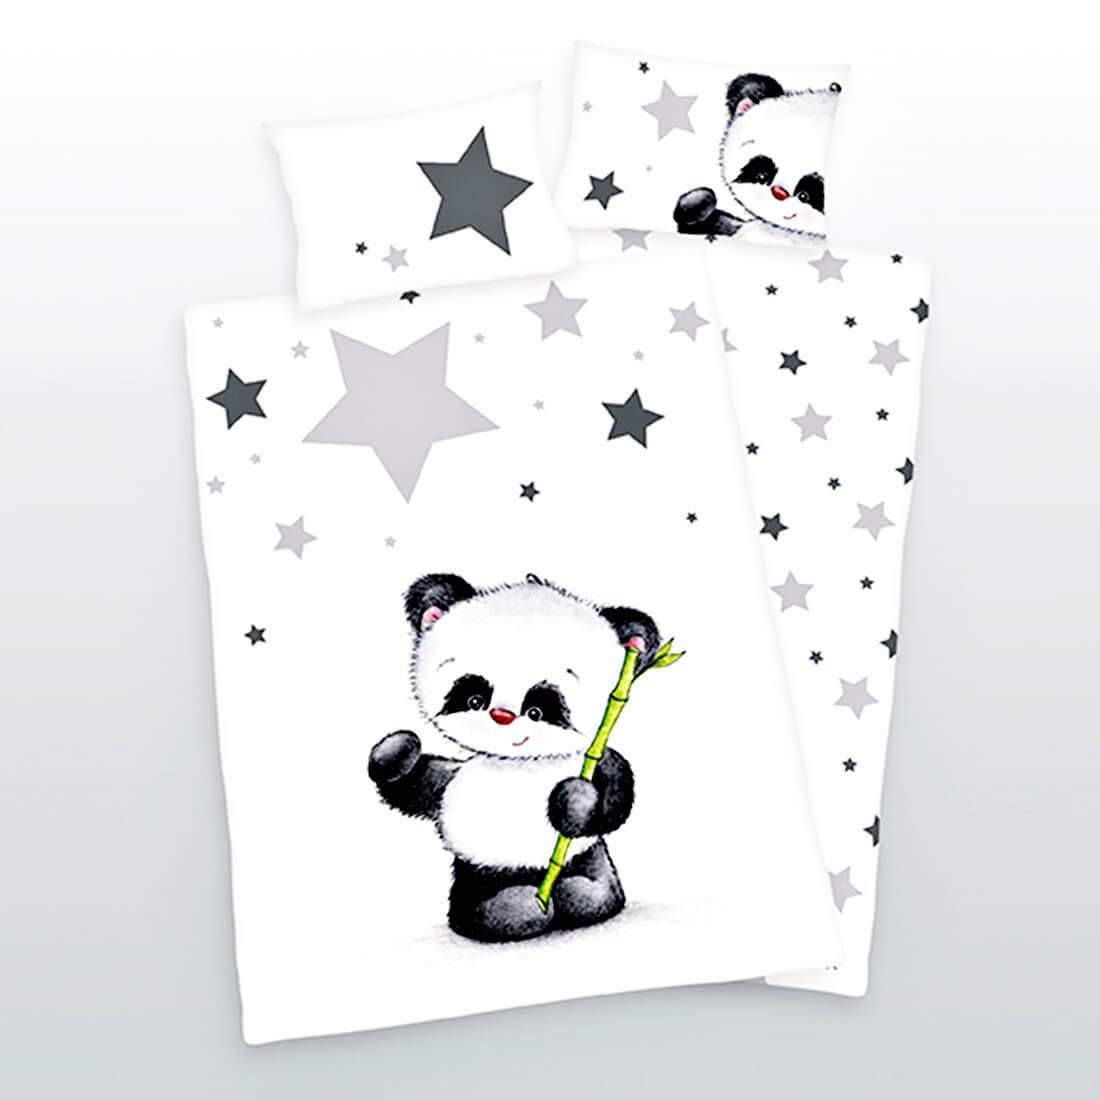 Fodera Cuscino: 40 cm x 60 cm; Renforc/é Rainbowfun.de Baby Best 100/% Cotone Grigio Nero ; Lenzuola: 100 cm x 135 cm Panda Lenzuola di Herding; Bianco